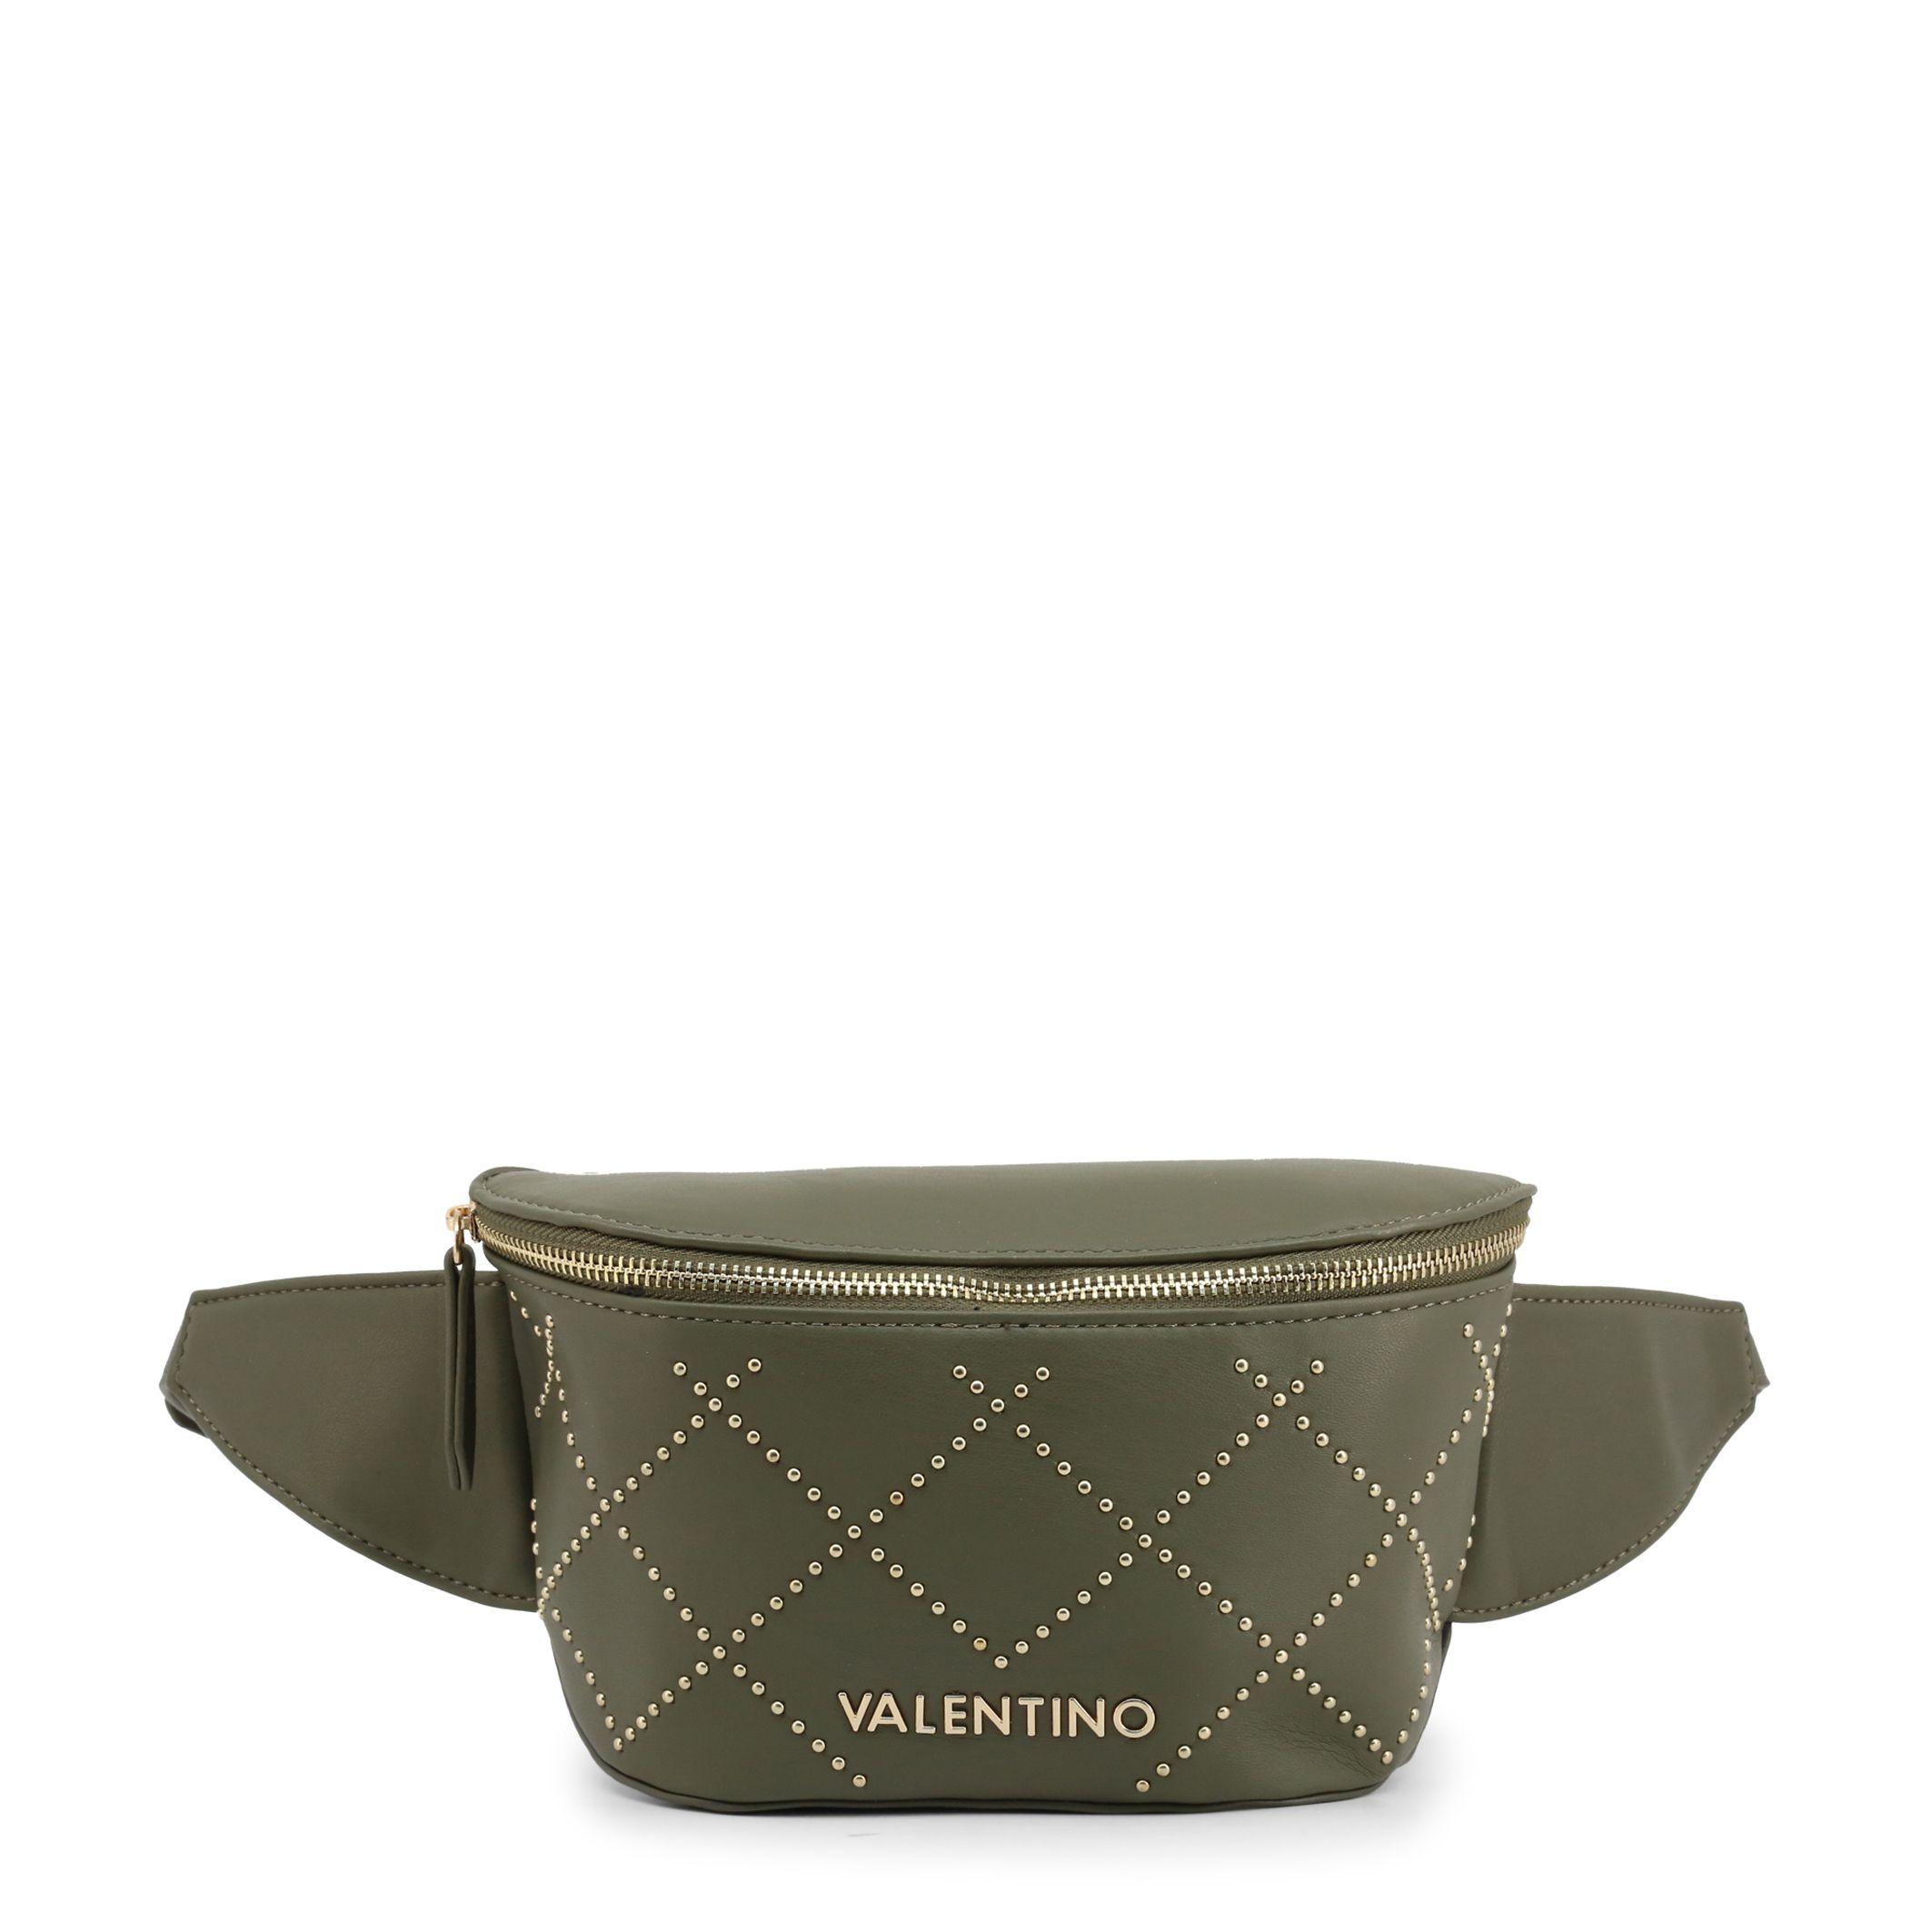 Valentino by Mario Valentino – VBS3KI06